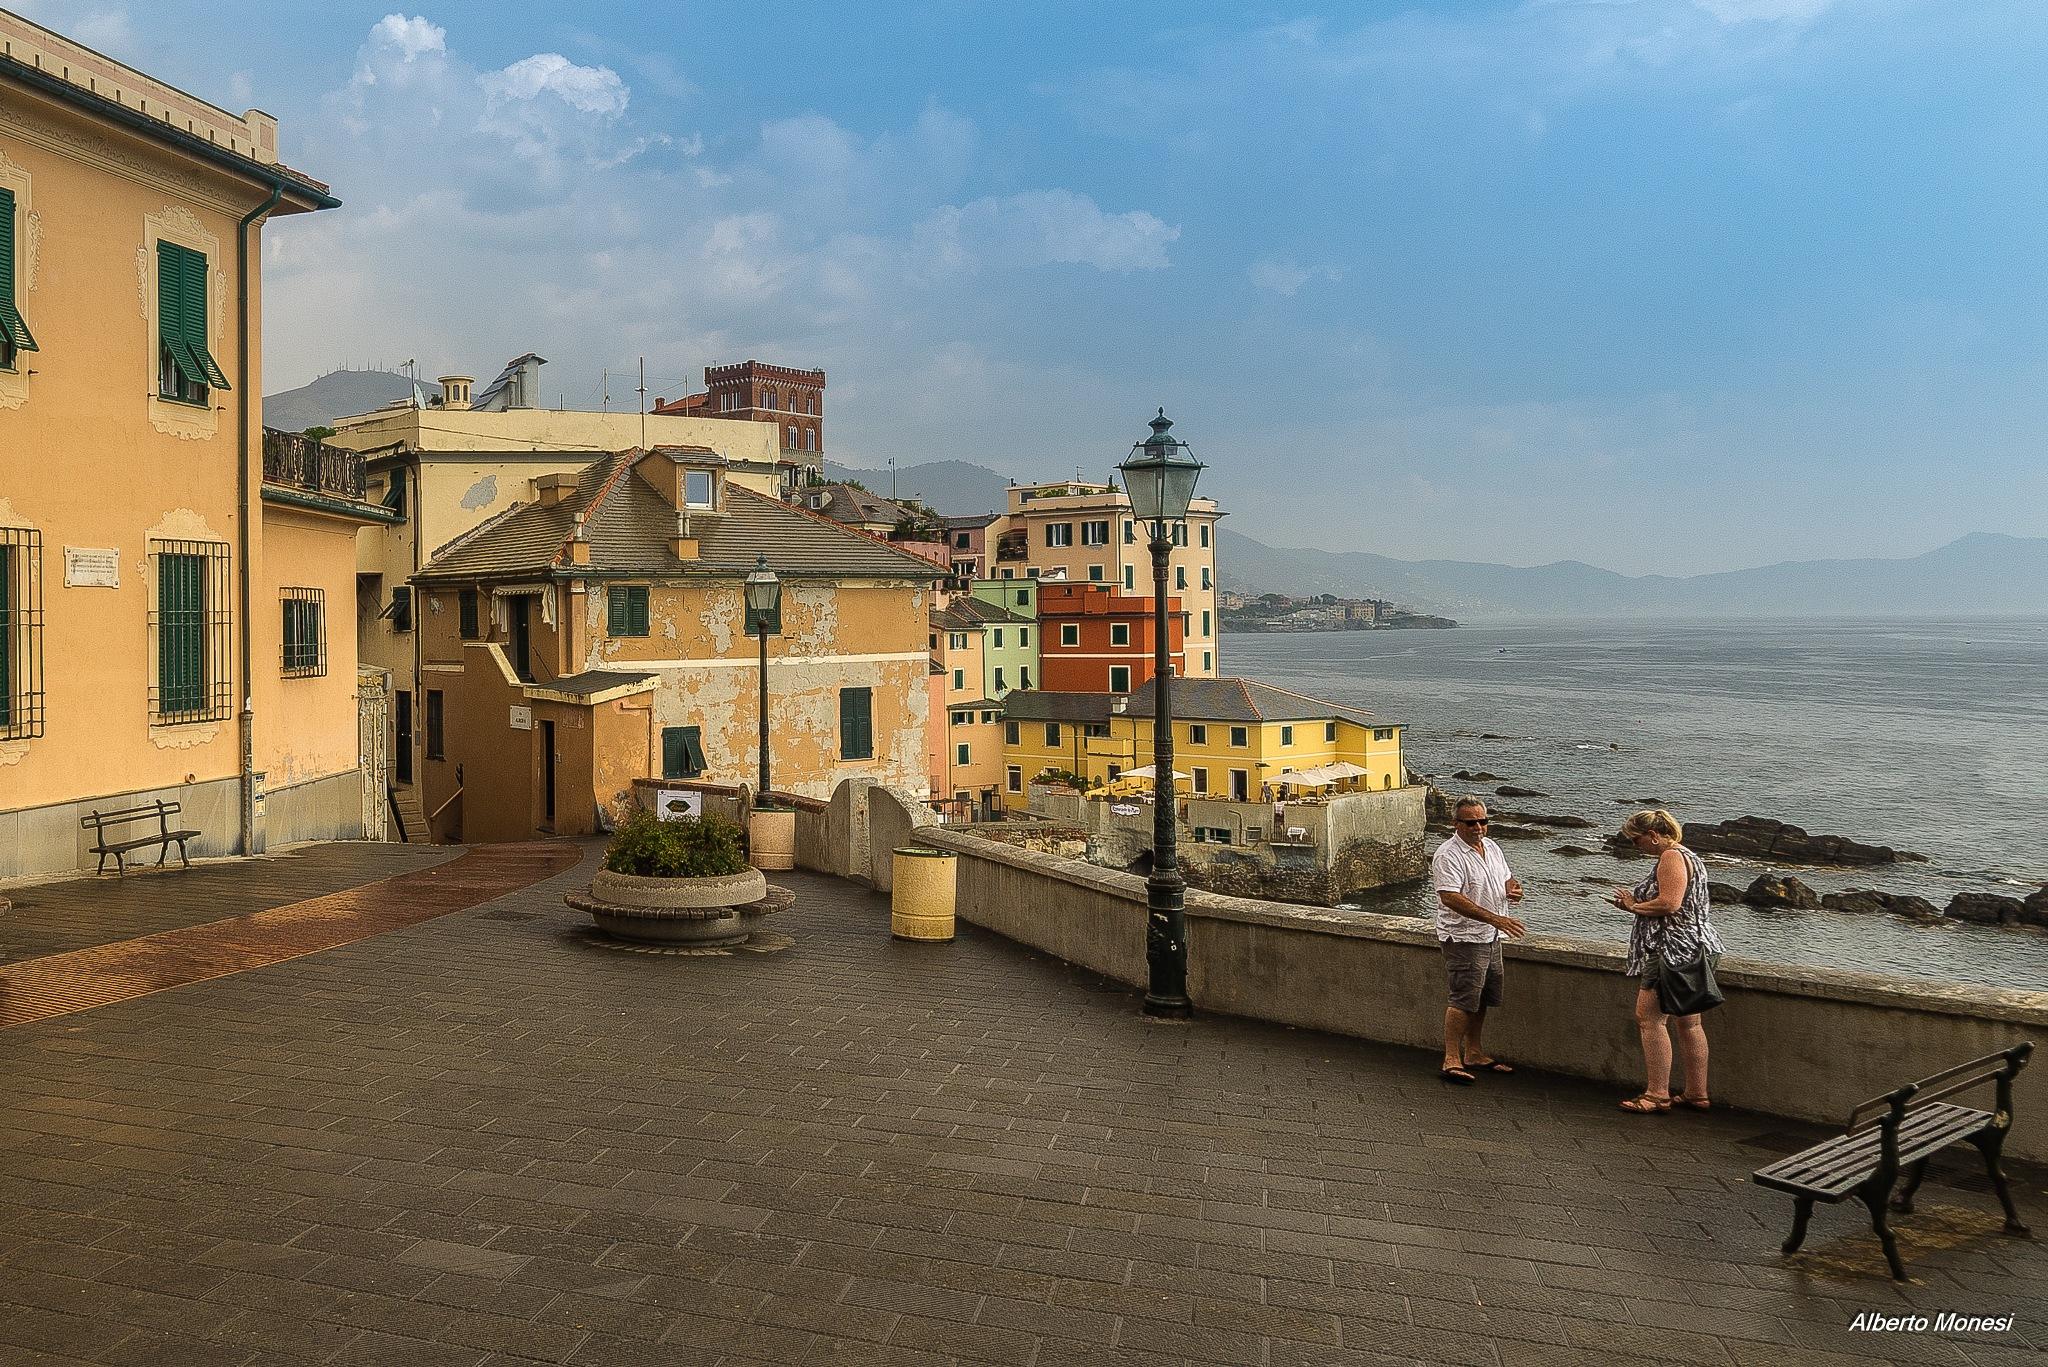 Genova Boccadasse by Alberto Monesi